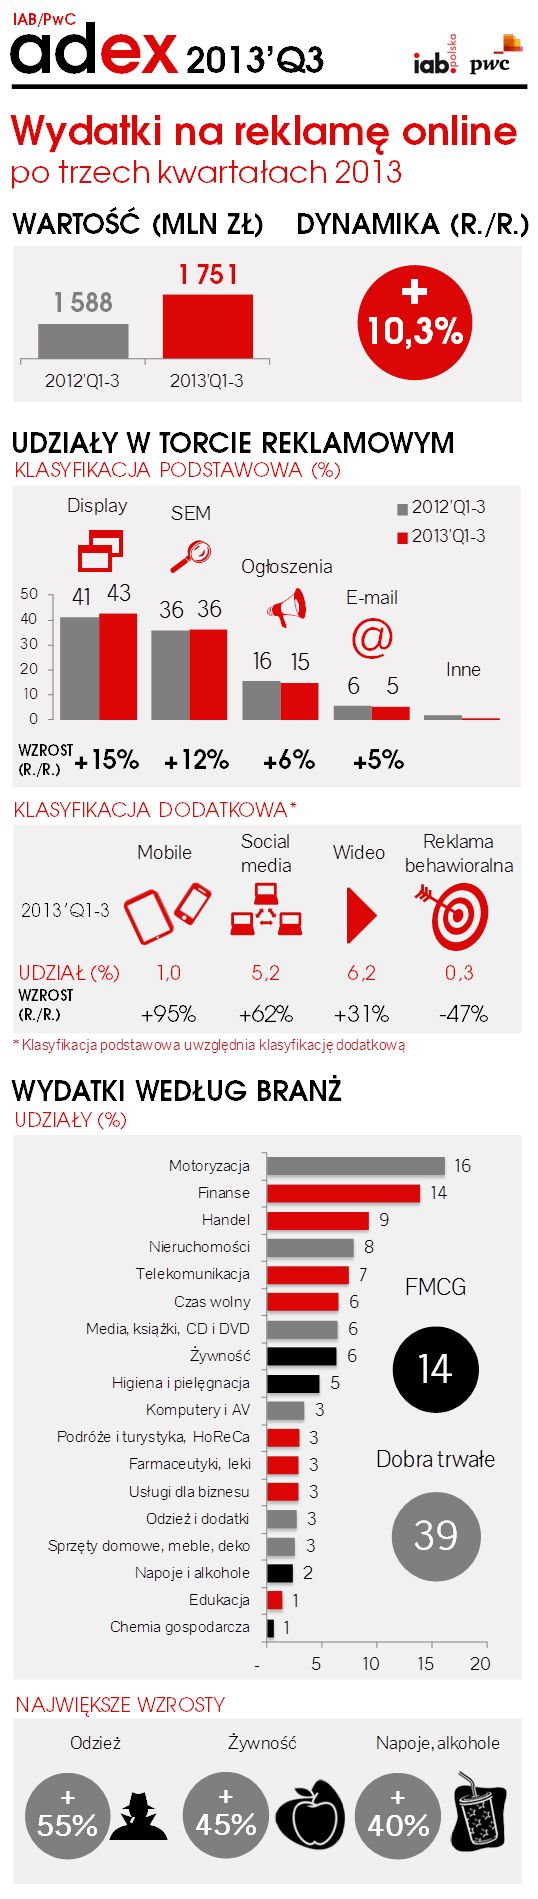 http://iab.org.pl/badania-i-publikacje/iab-adex-2013-q3/